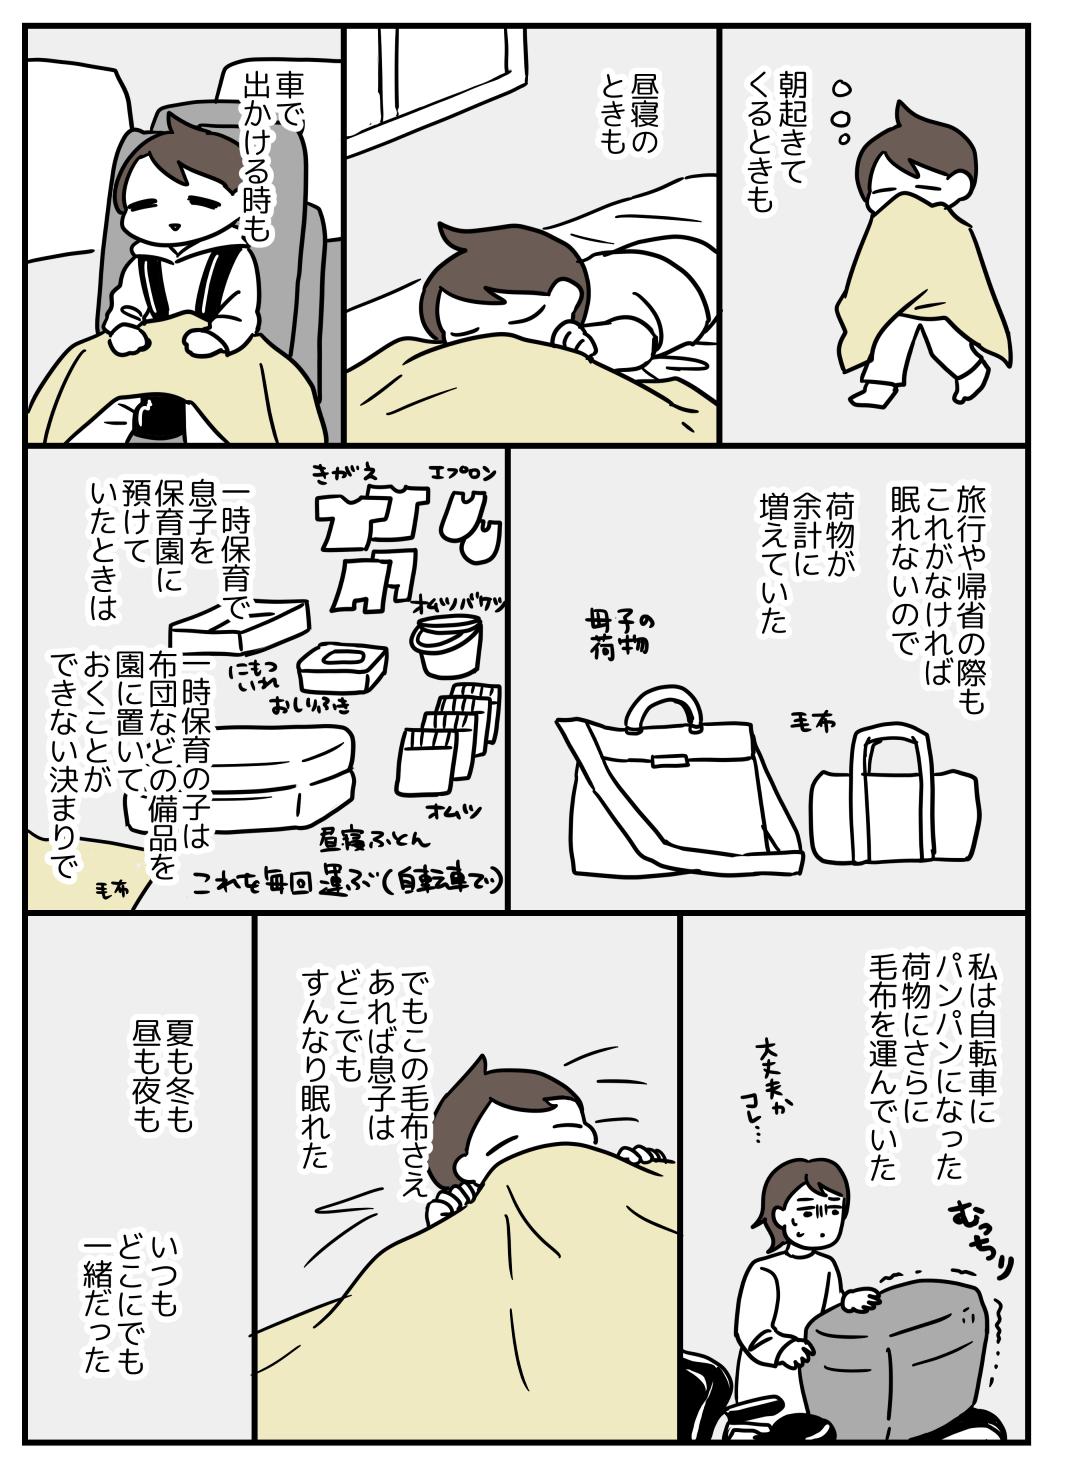 f:id:kanemotonomukuu:20181207135234j:plain